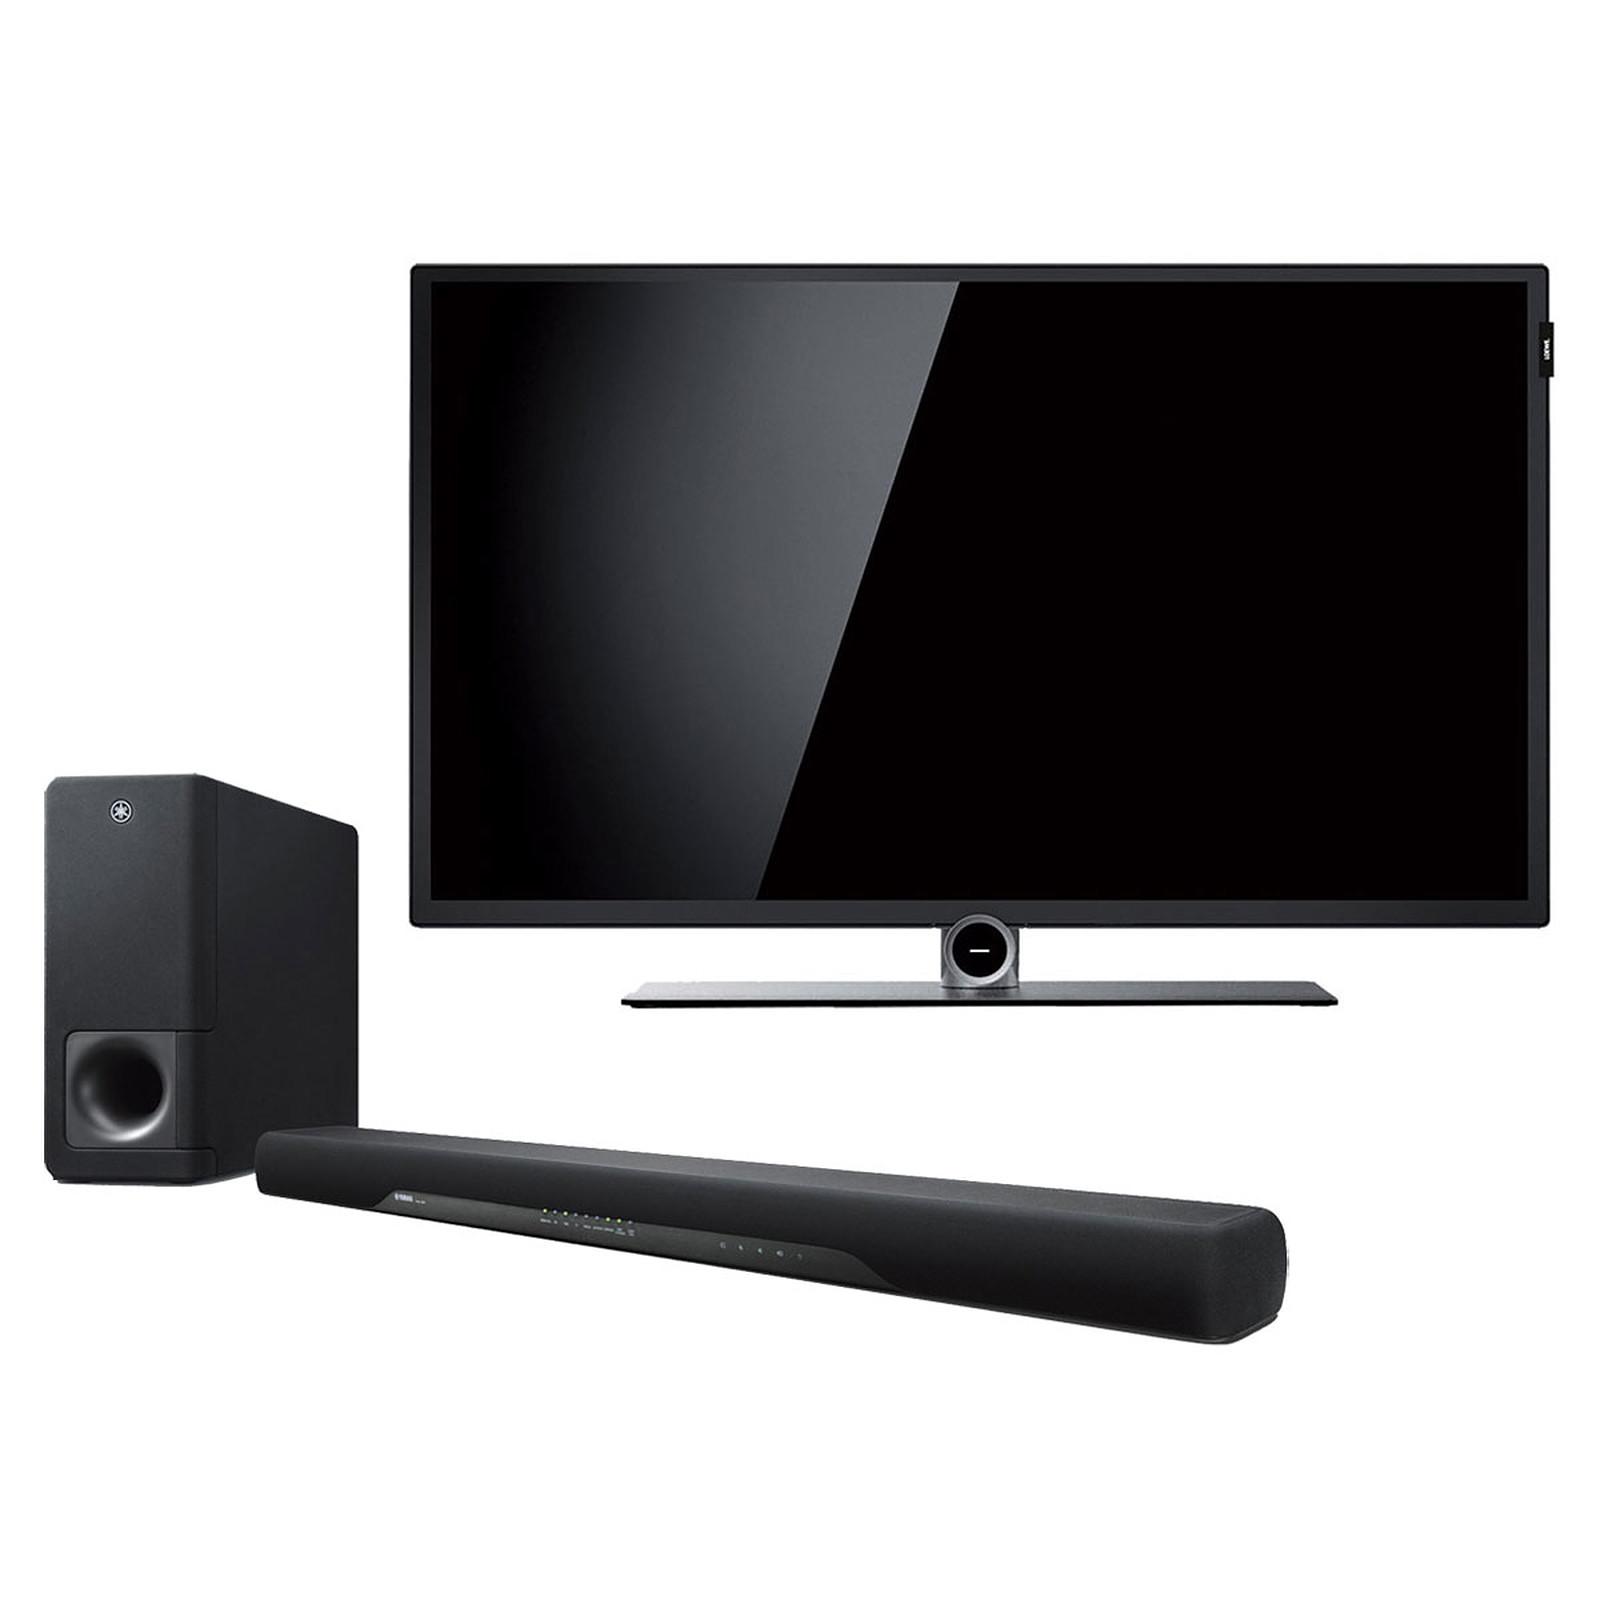 loewe bild noir yamaha ats 2070 tv loewe sur. Black Bedroom Furniture Sets. Home Design Ideas